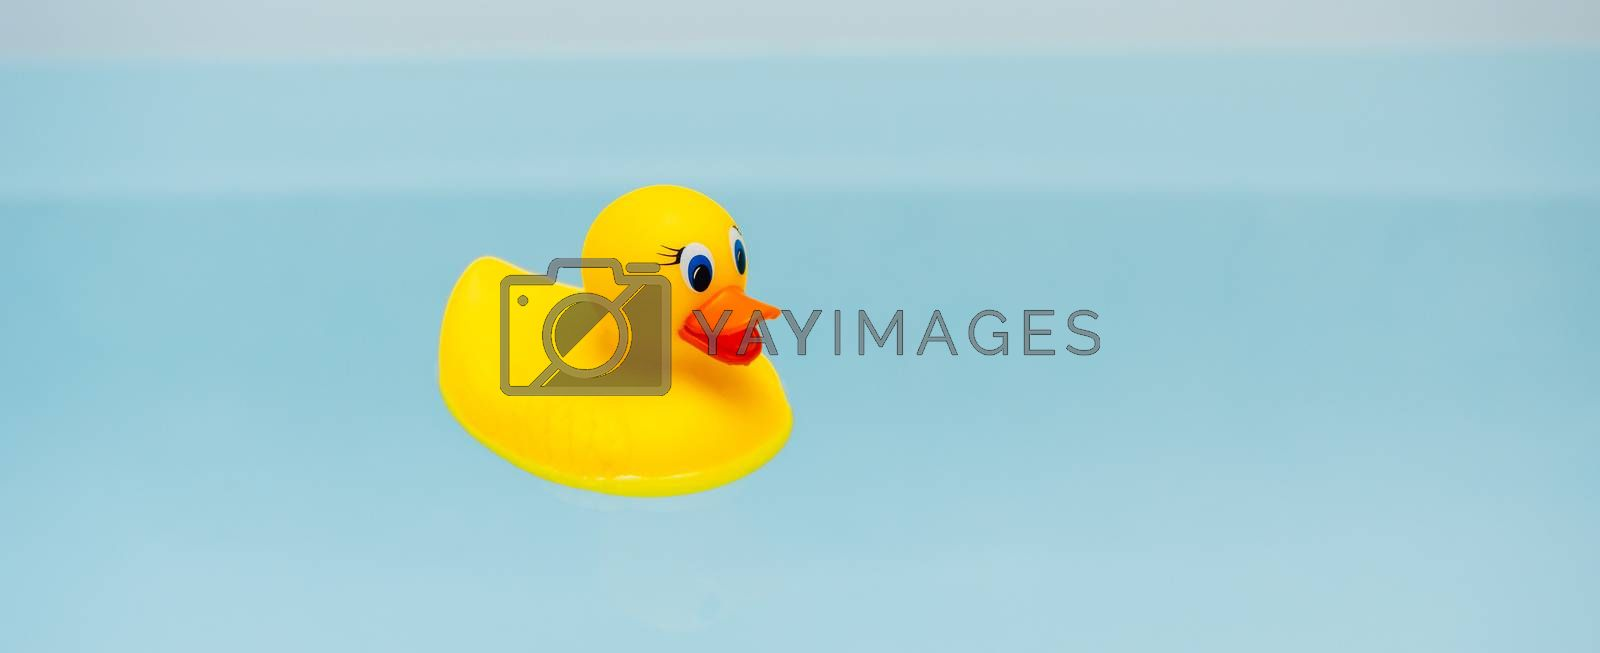 yellow rubber duck in blue water of bathtub